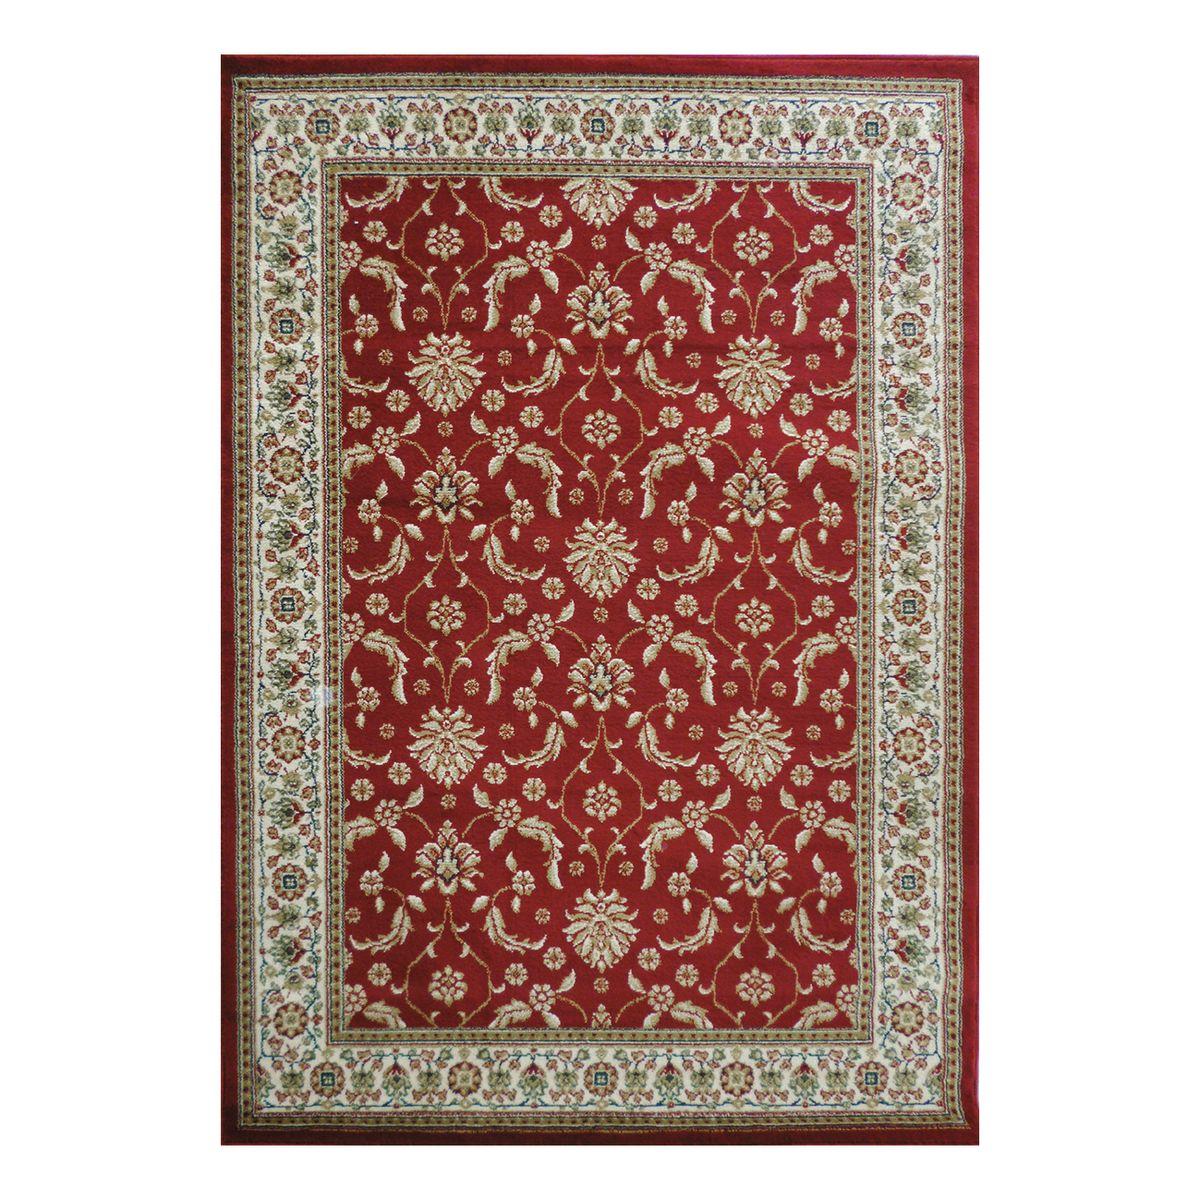 Cool mobili per ingresso casa offerta tappeti per arredare - Tappeti ingresso moderni ...